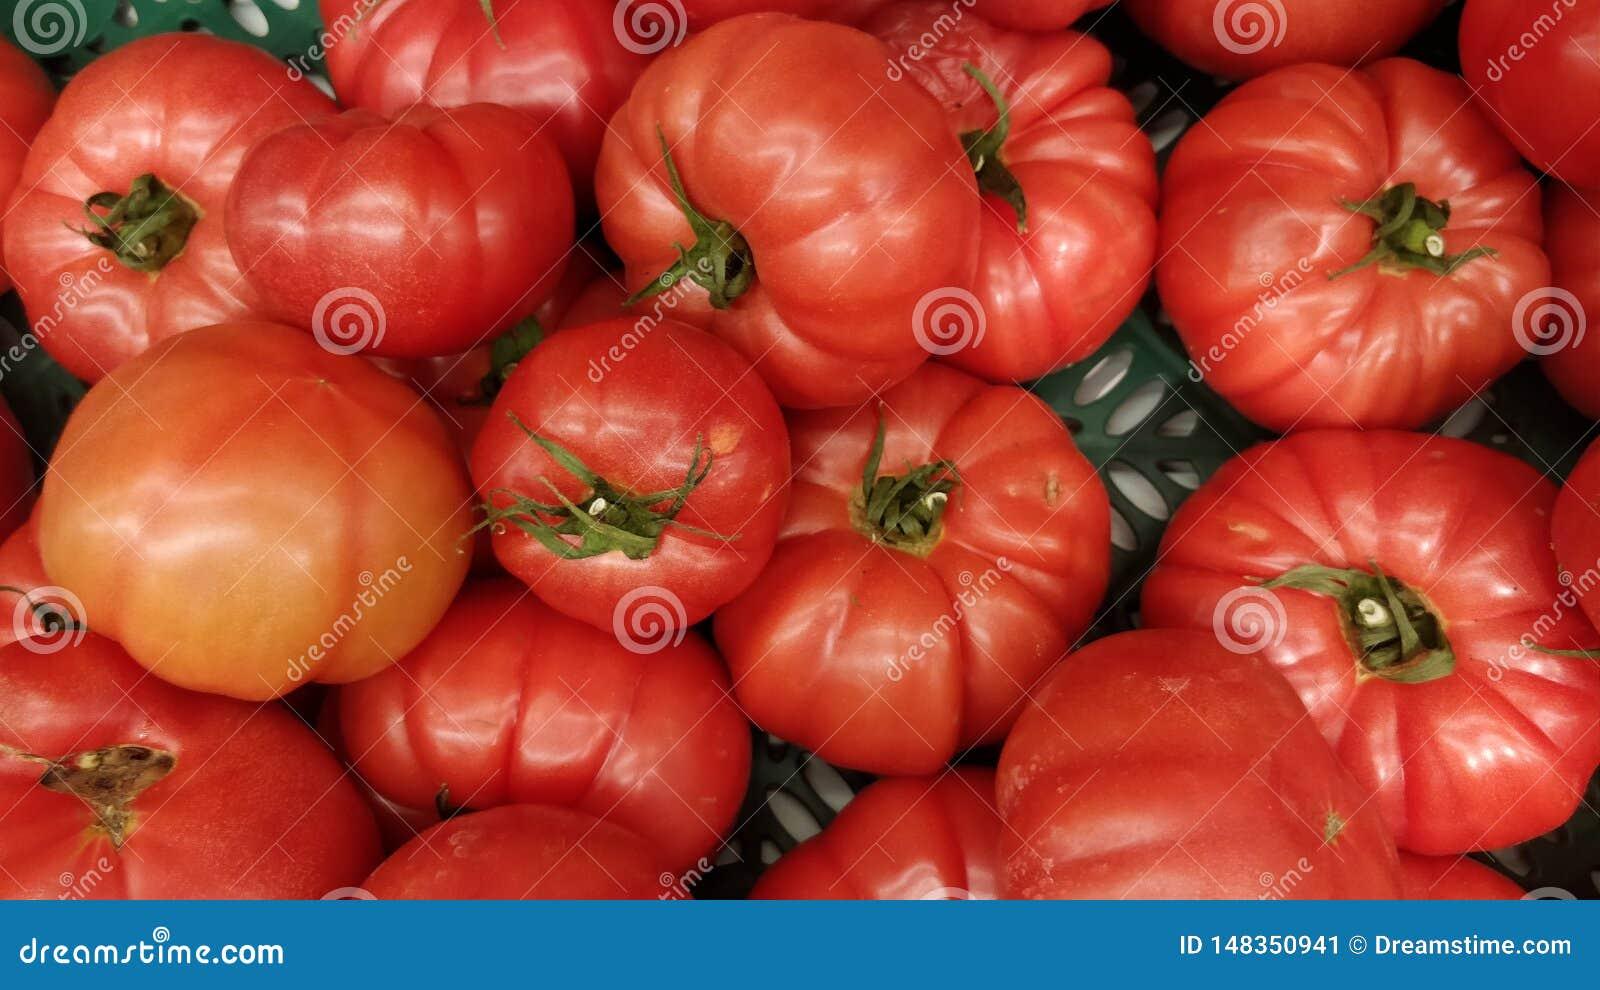 Tomatoes on a supermarket shelf.